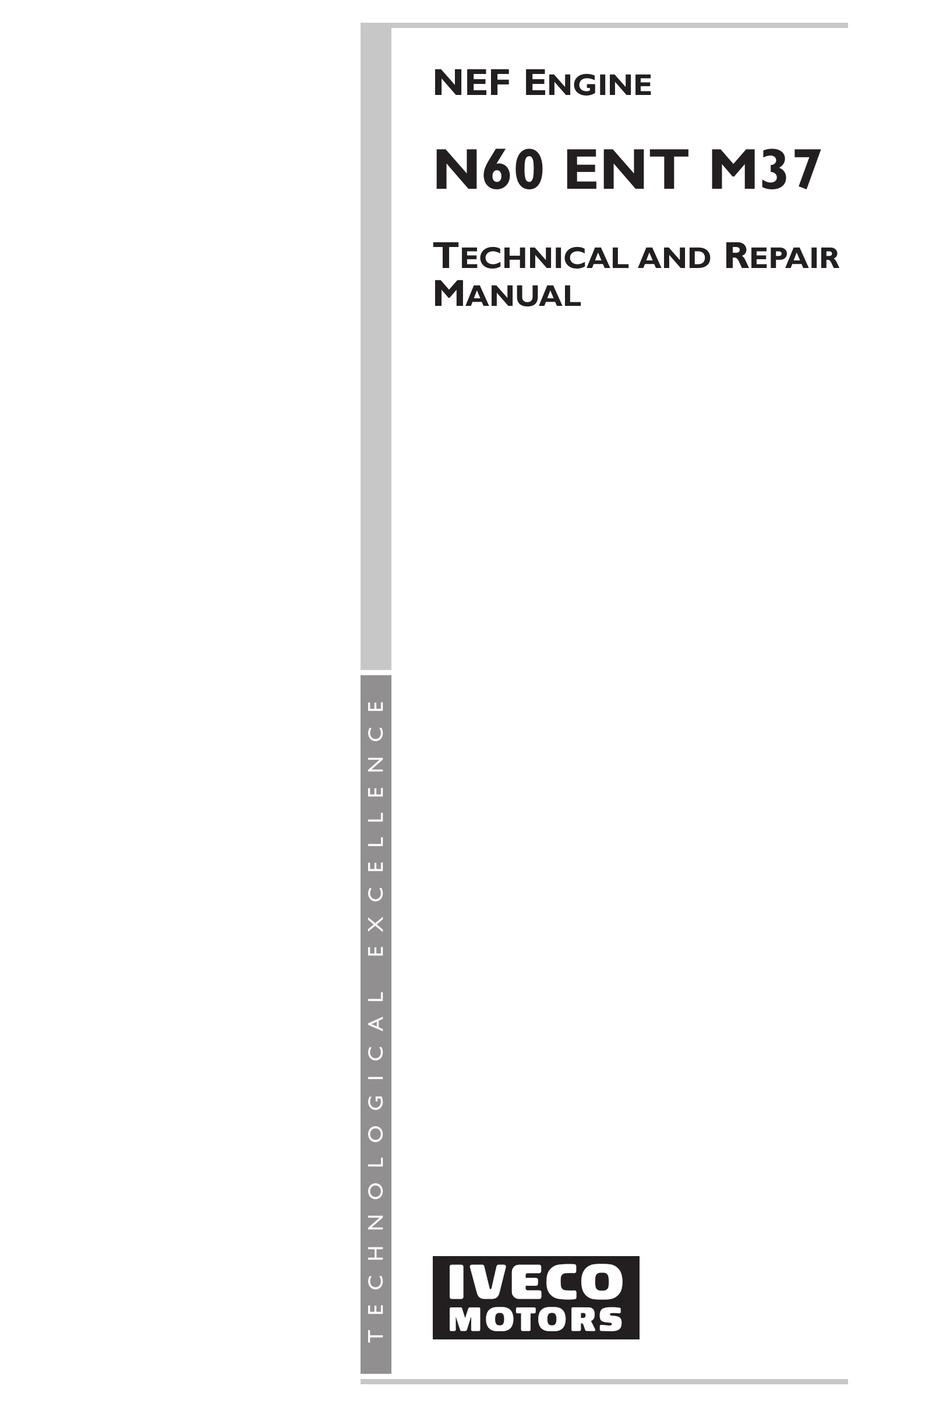 IVECO N60 ENT M37 TECHNICAL AND REPAIR MANUAL Pdf Download